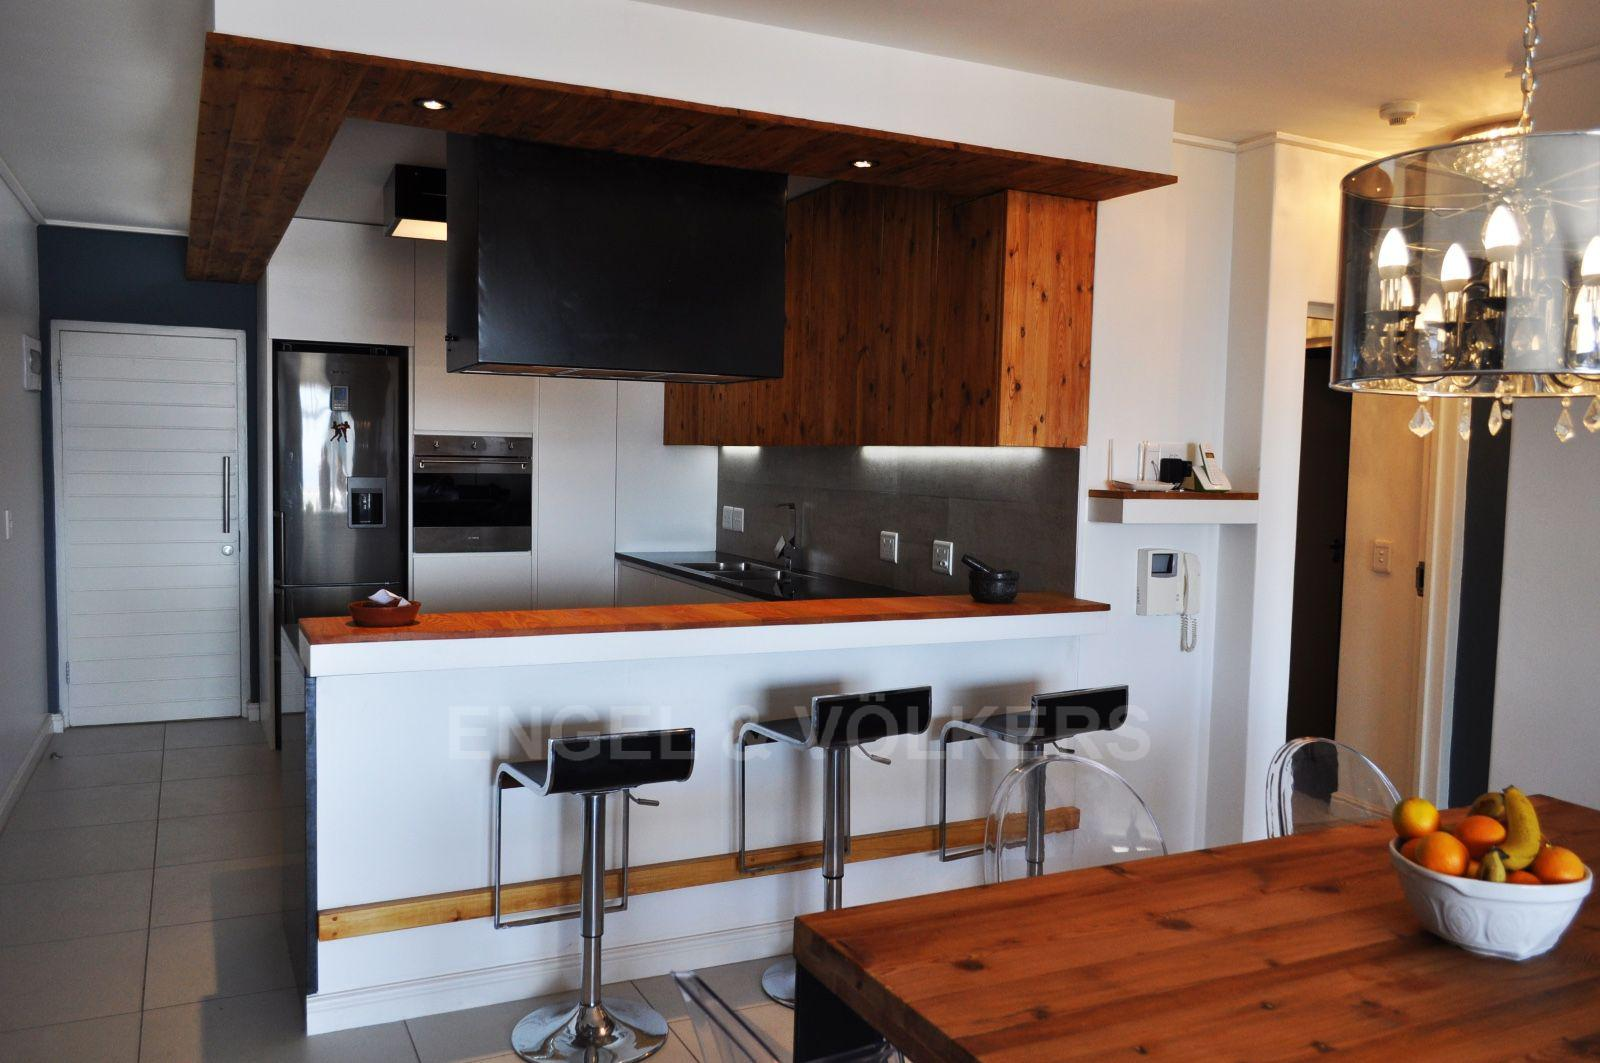 De Waterkant property for sale. Ref No: 13450081. Picture no 6